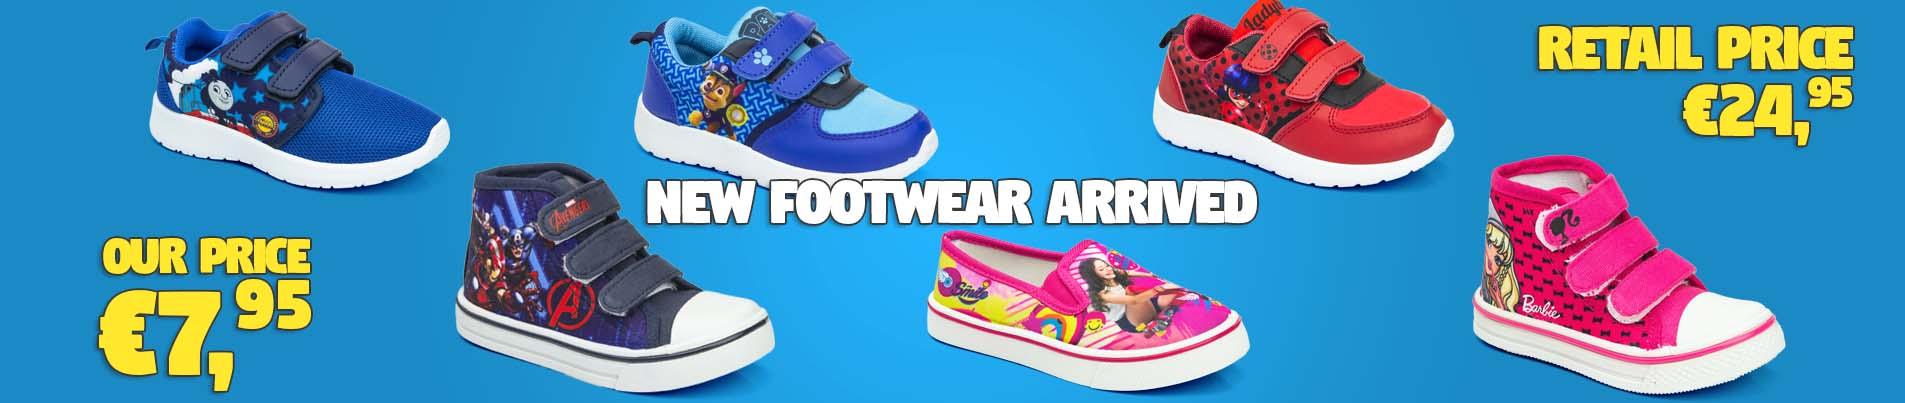 Footwear for children wholesale Disney licenses.